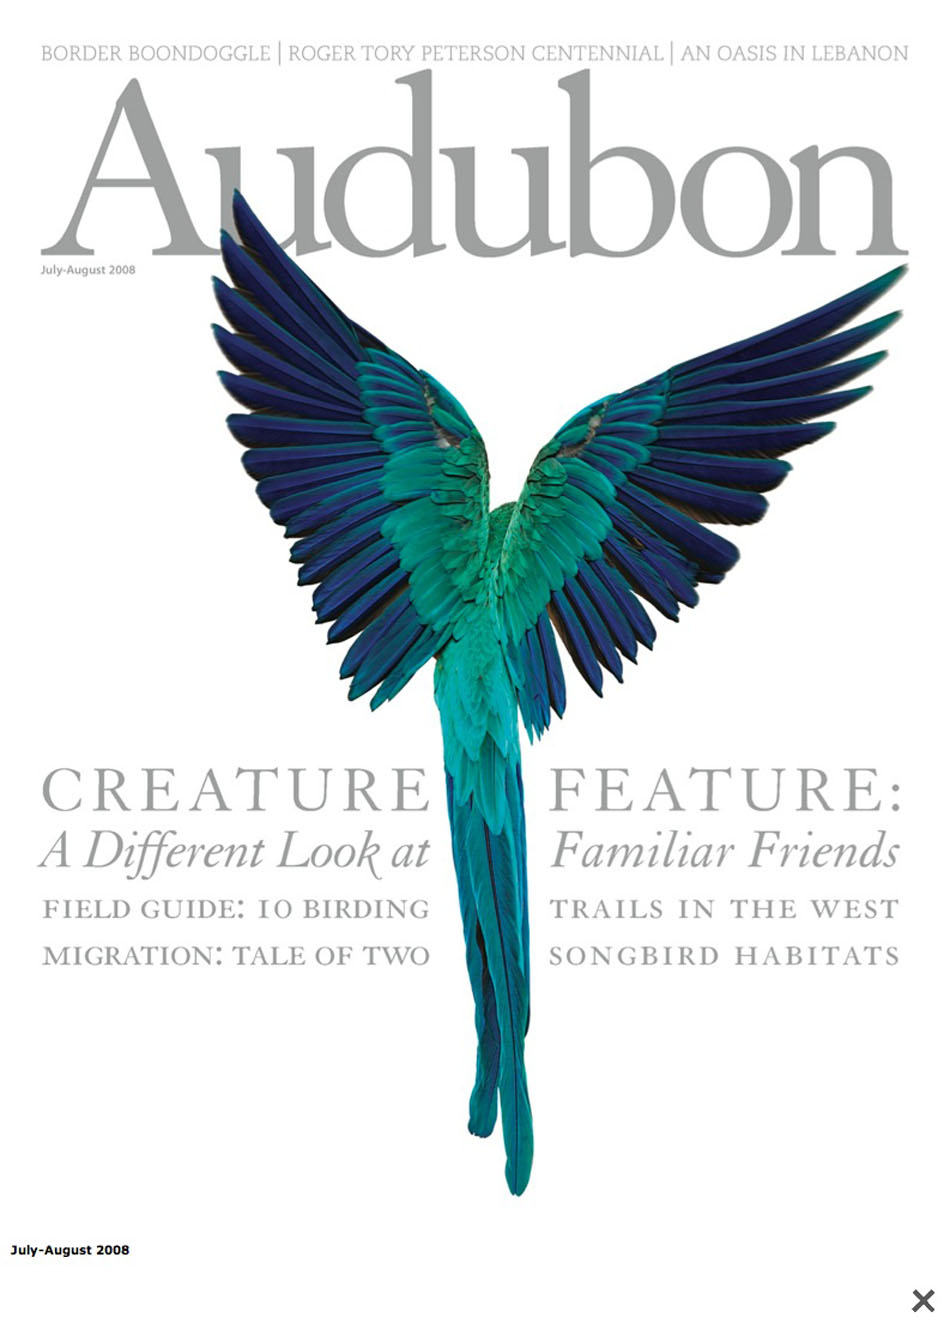 audubon2.jpg